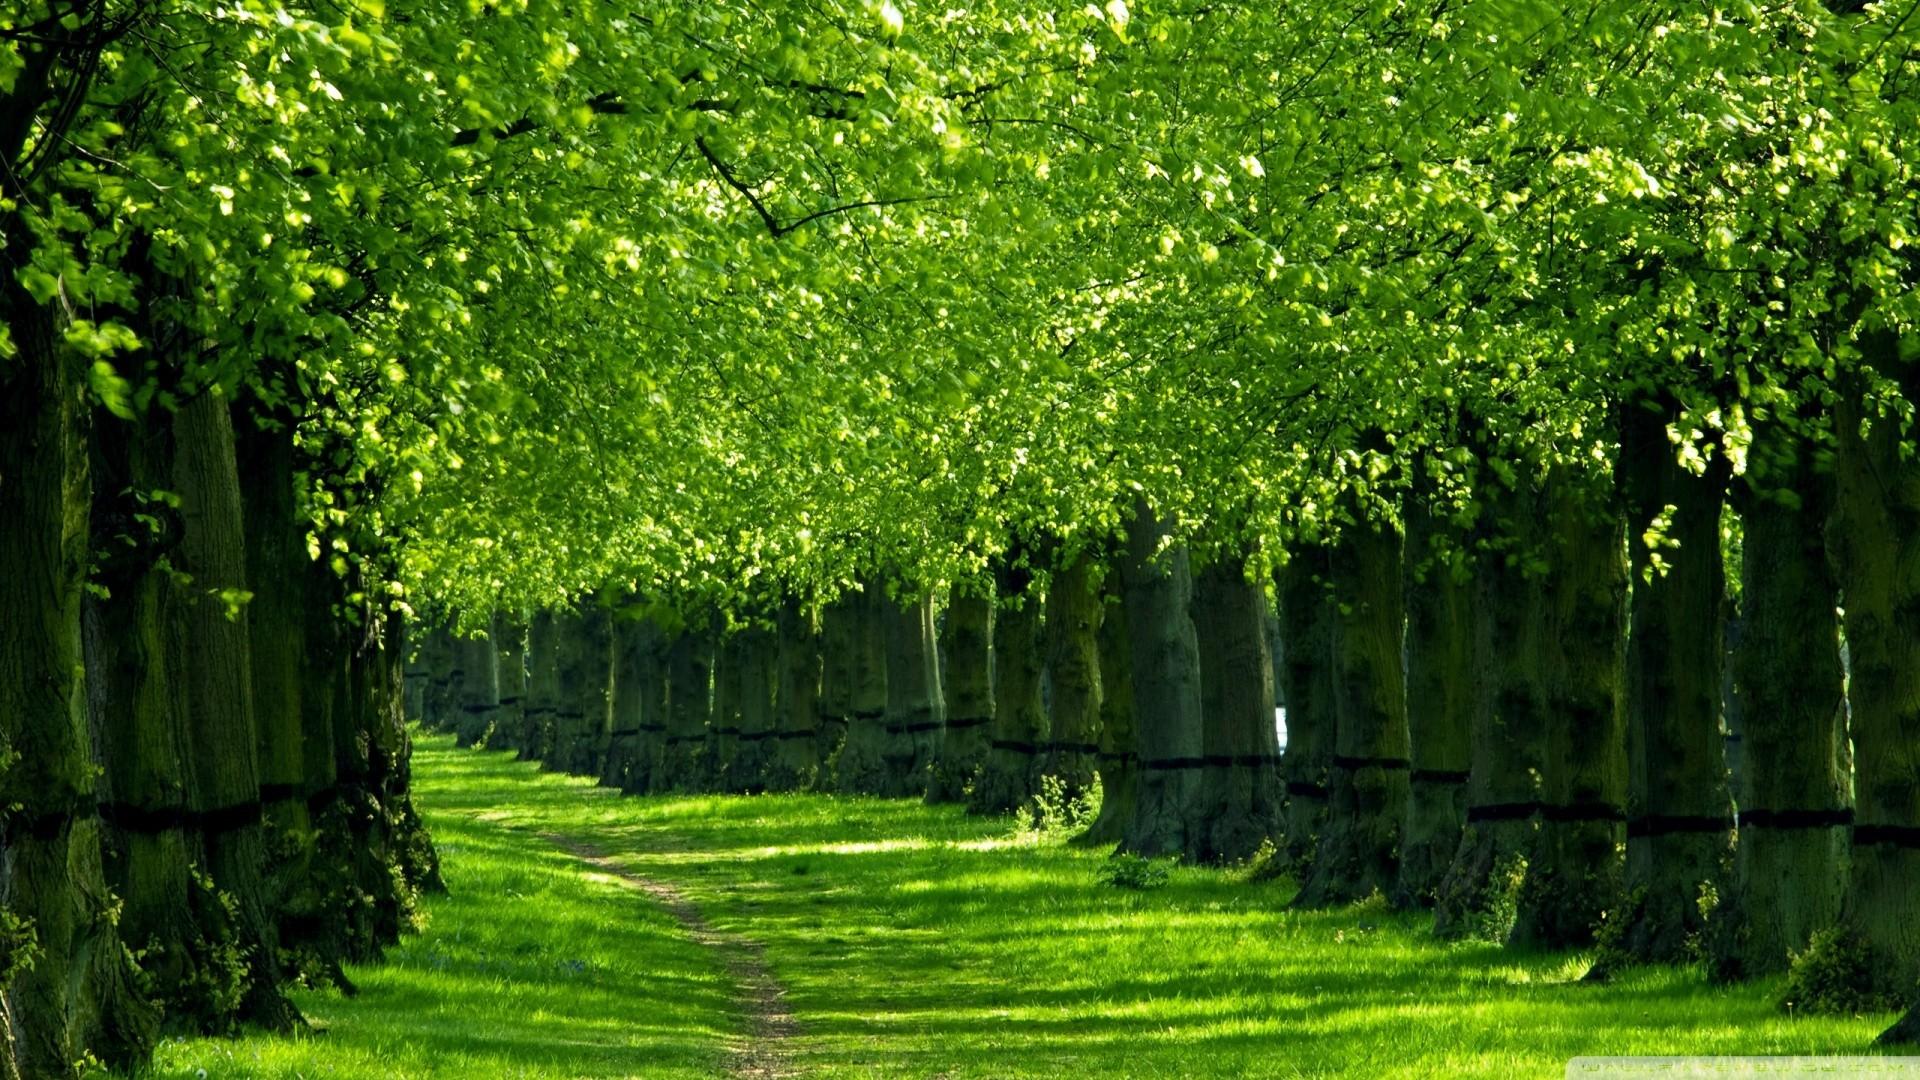 Hd wallpaper nature green - Green Nature Image